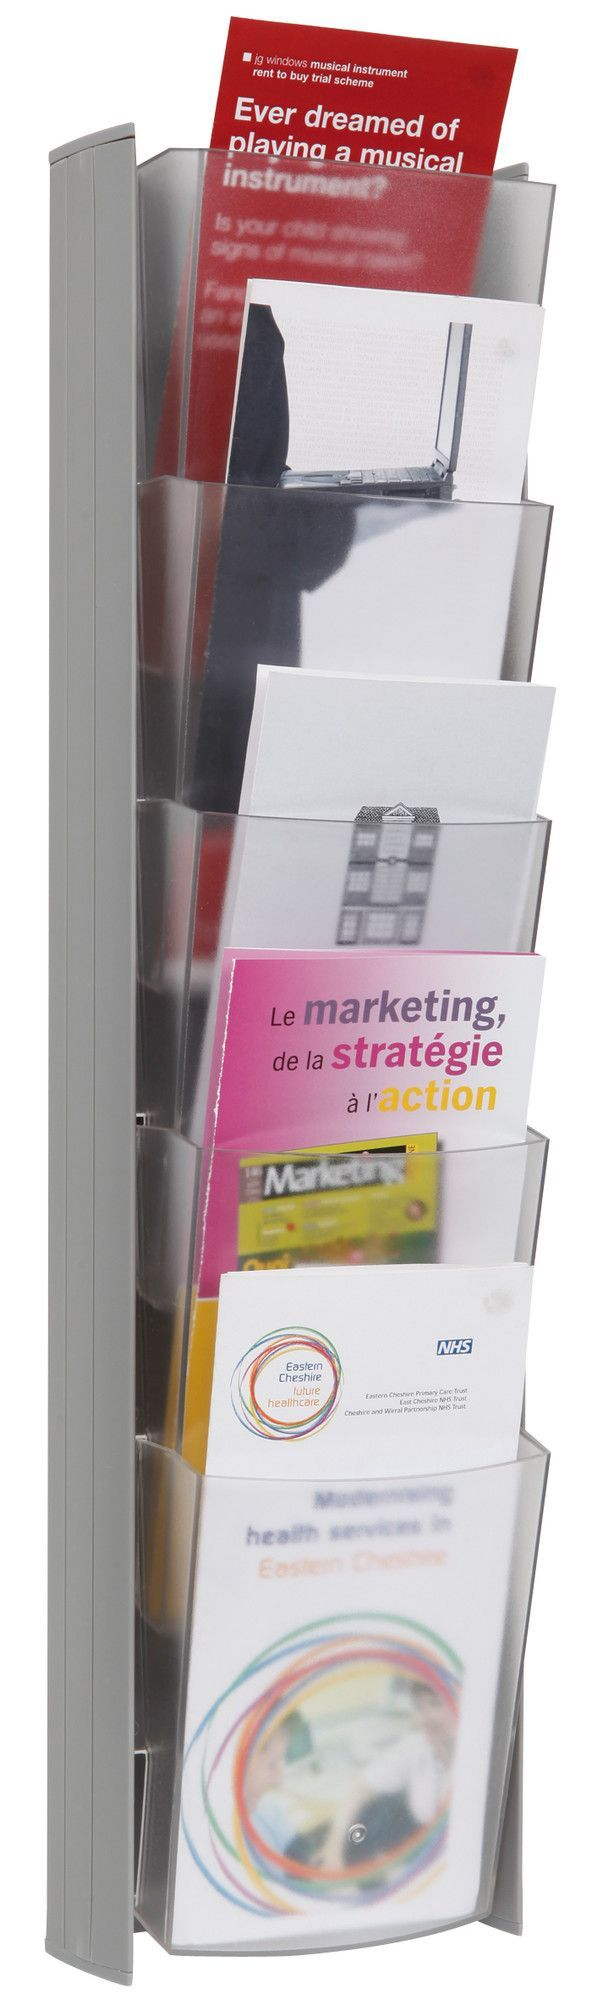 5 Pocket Wall Pamphlet Display